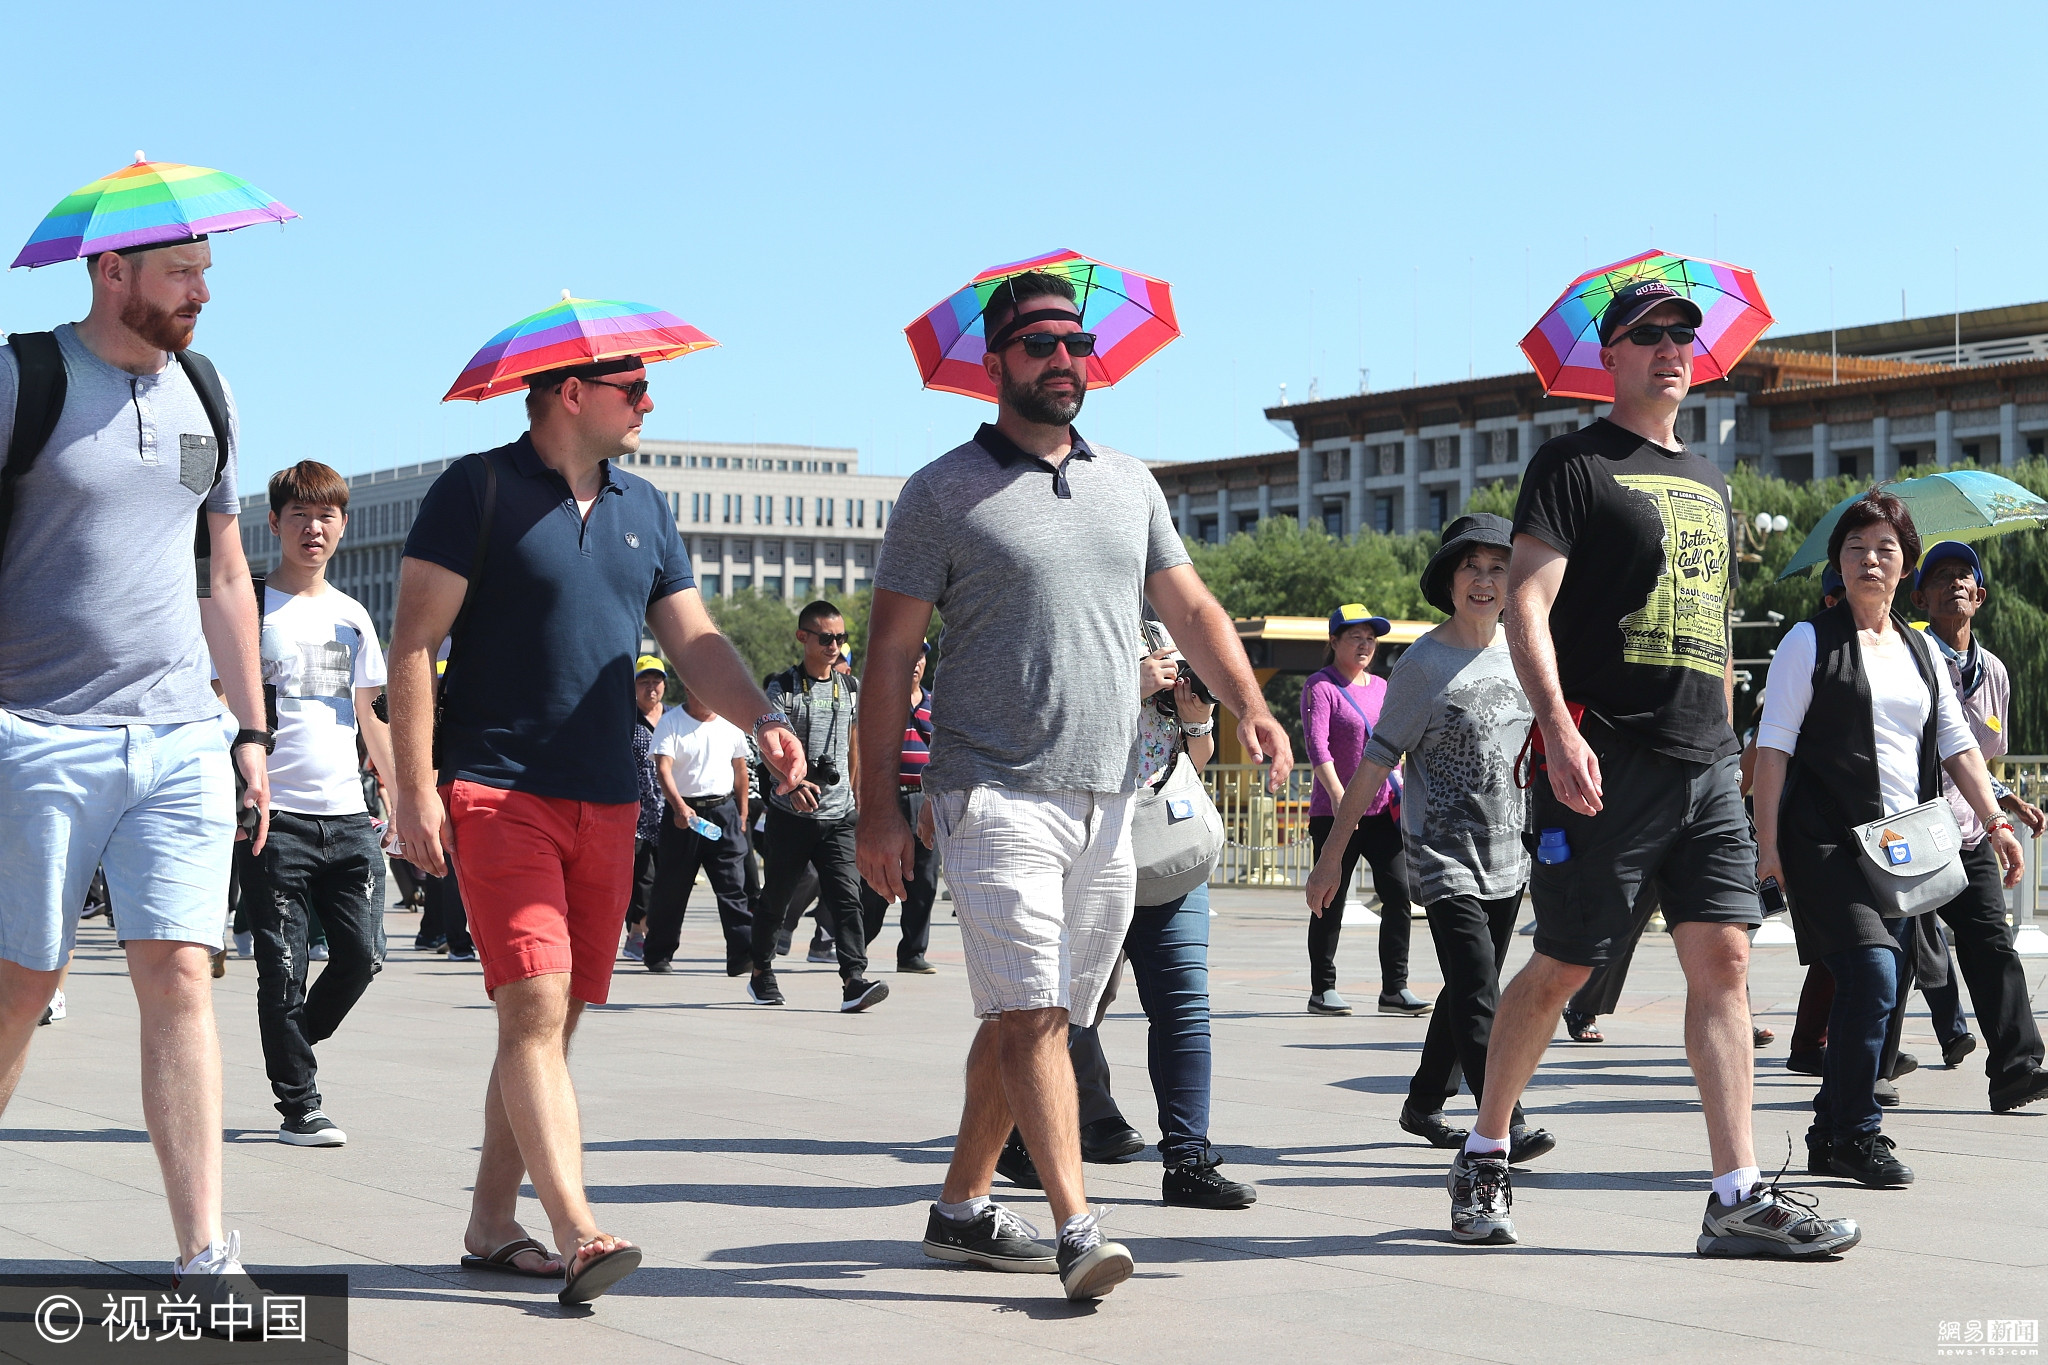 Sommerlicher Herbst in Beijing: Lustige Tricks gegen die Hitze